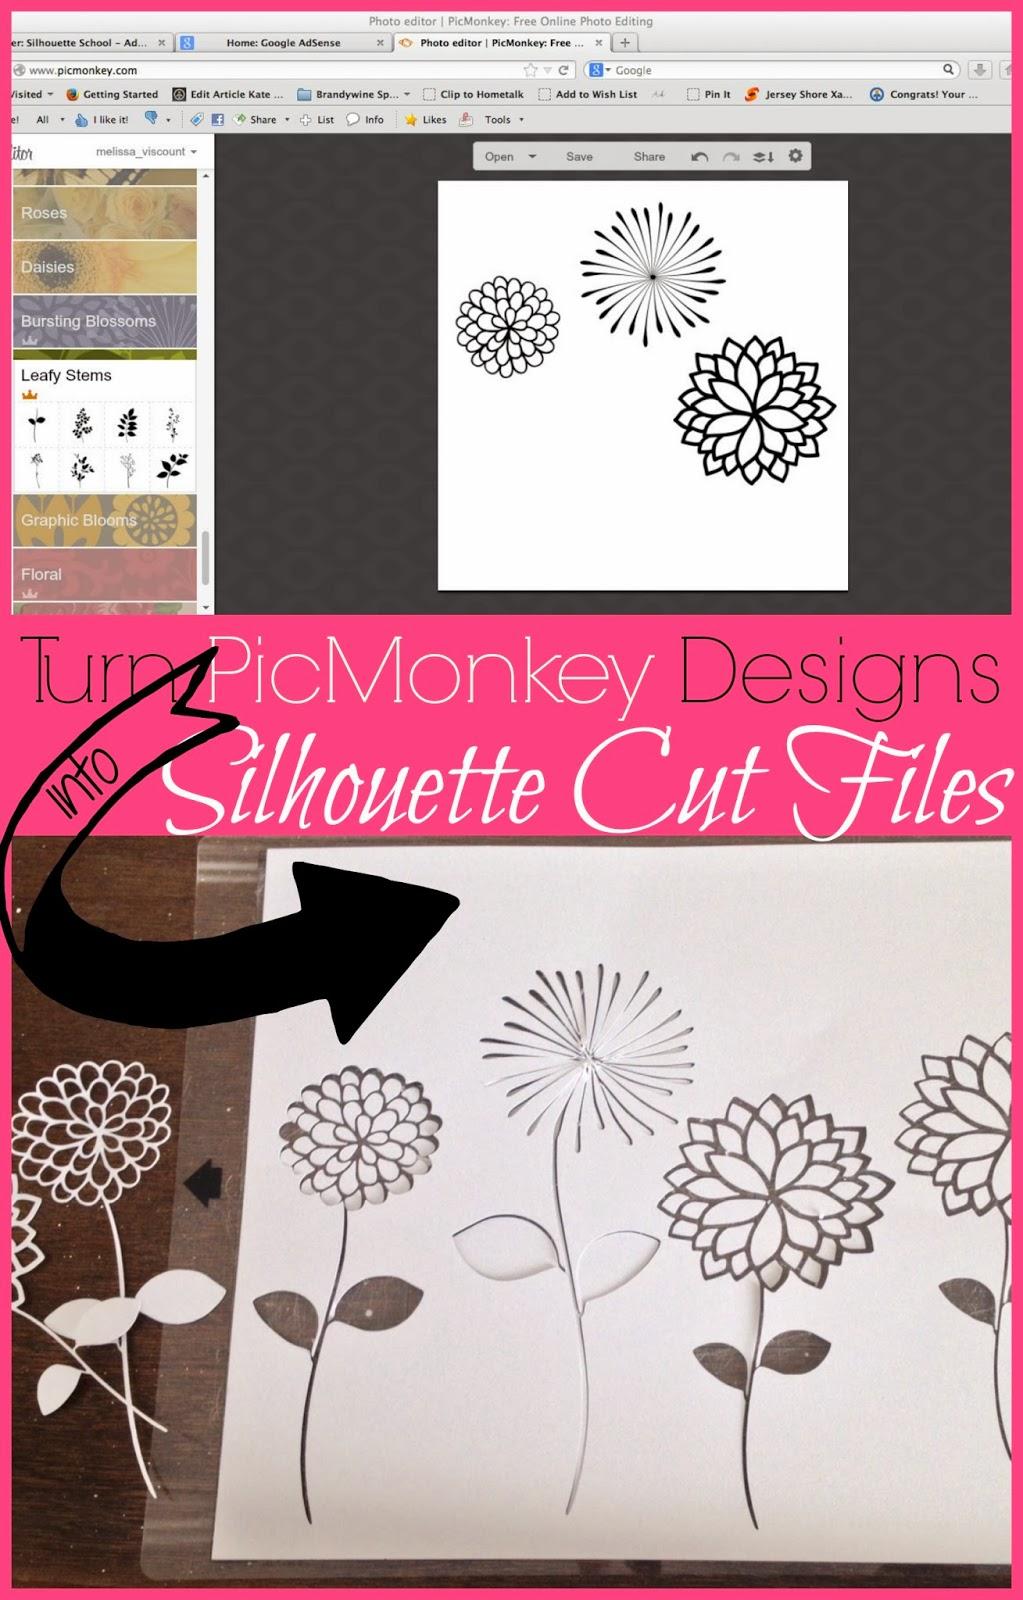 http://www.silhouetteschool.blogspot.com/2014/03/how-to-cut-picmonkey-designs-in.html